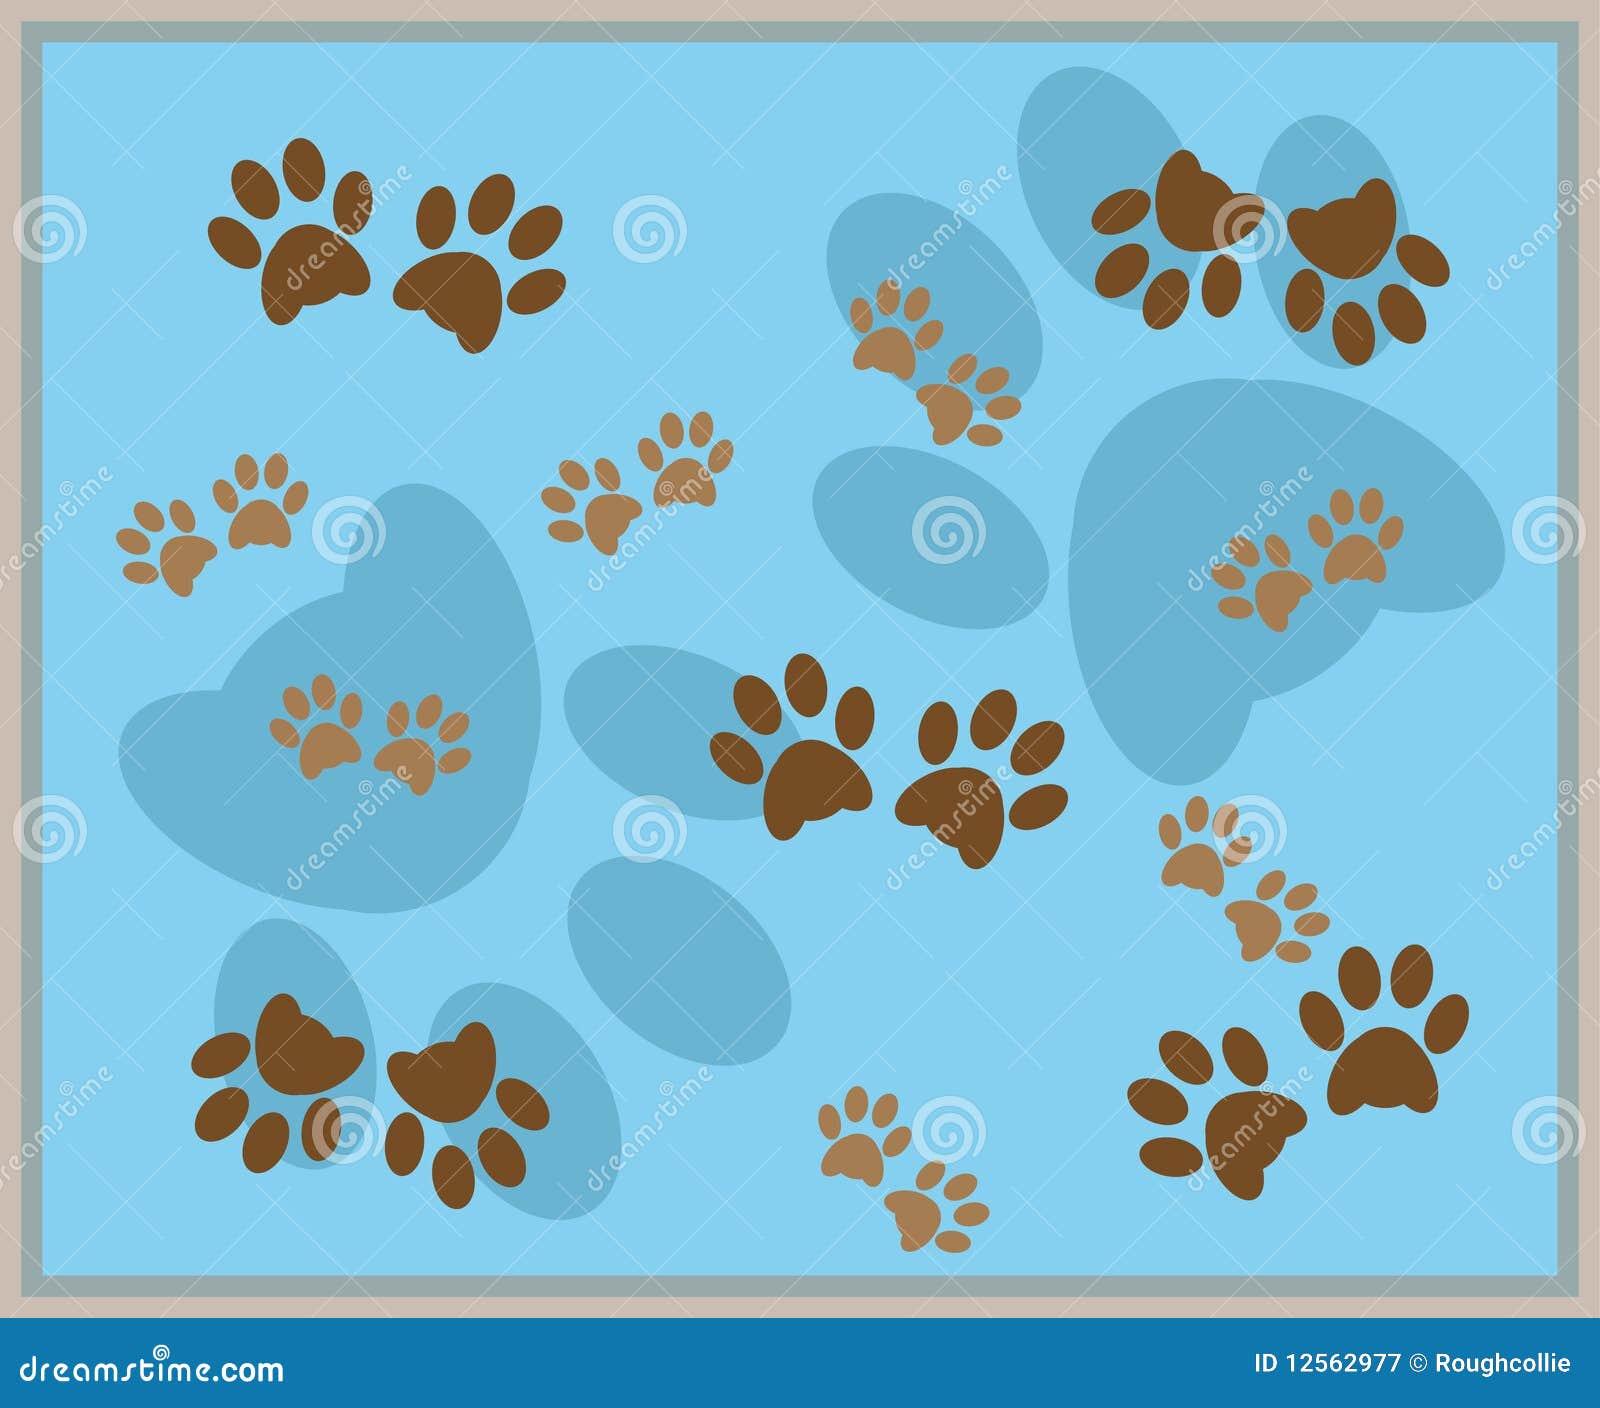 Free Dog Paw Print Template